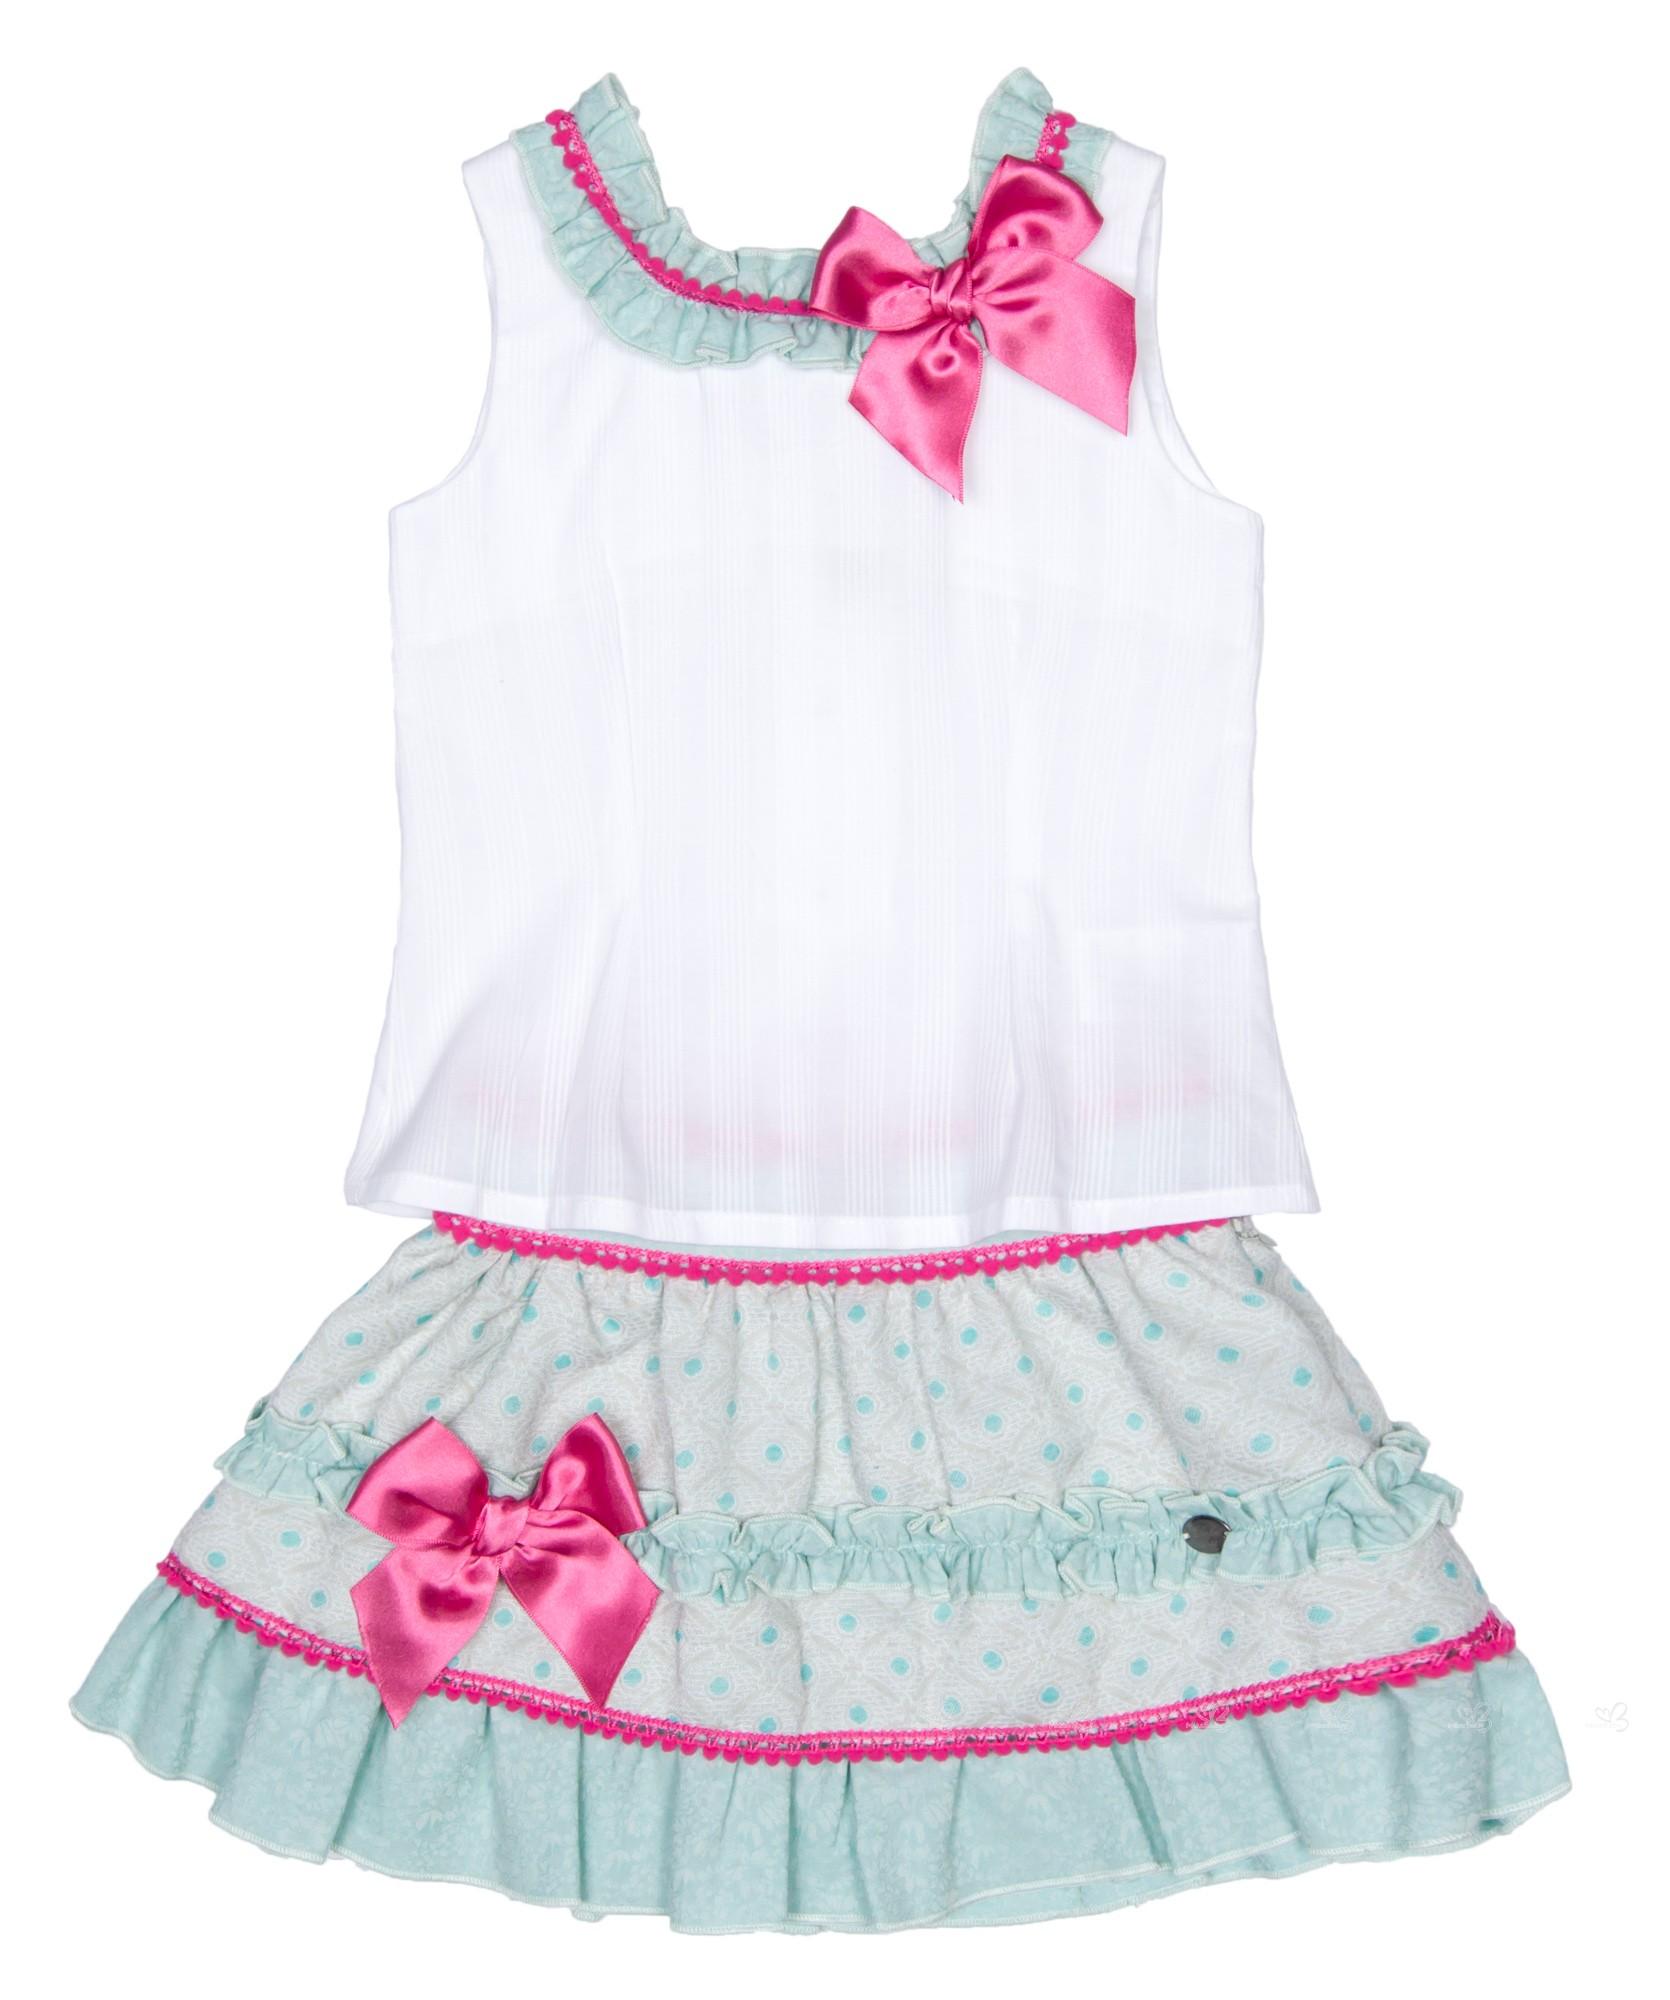 Dolce Petit girl dress white Dolce Petit Colección DOLCE PETIT Verano 2017